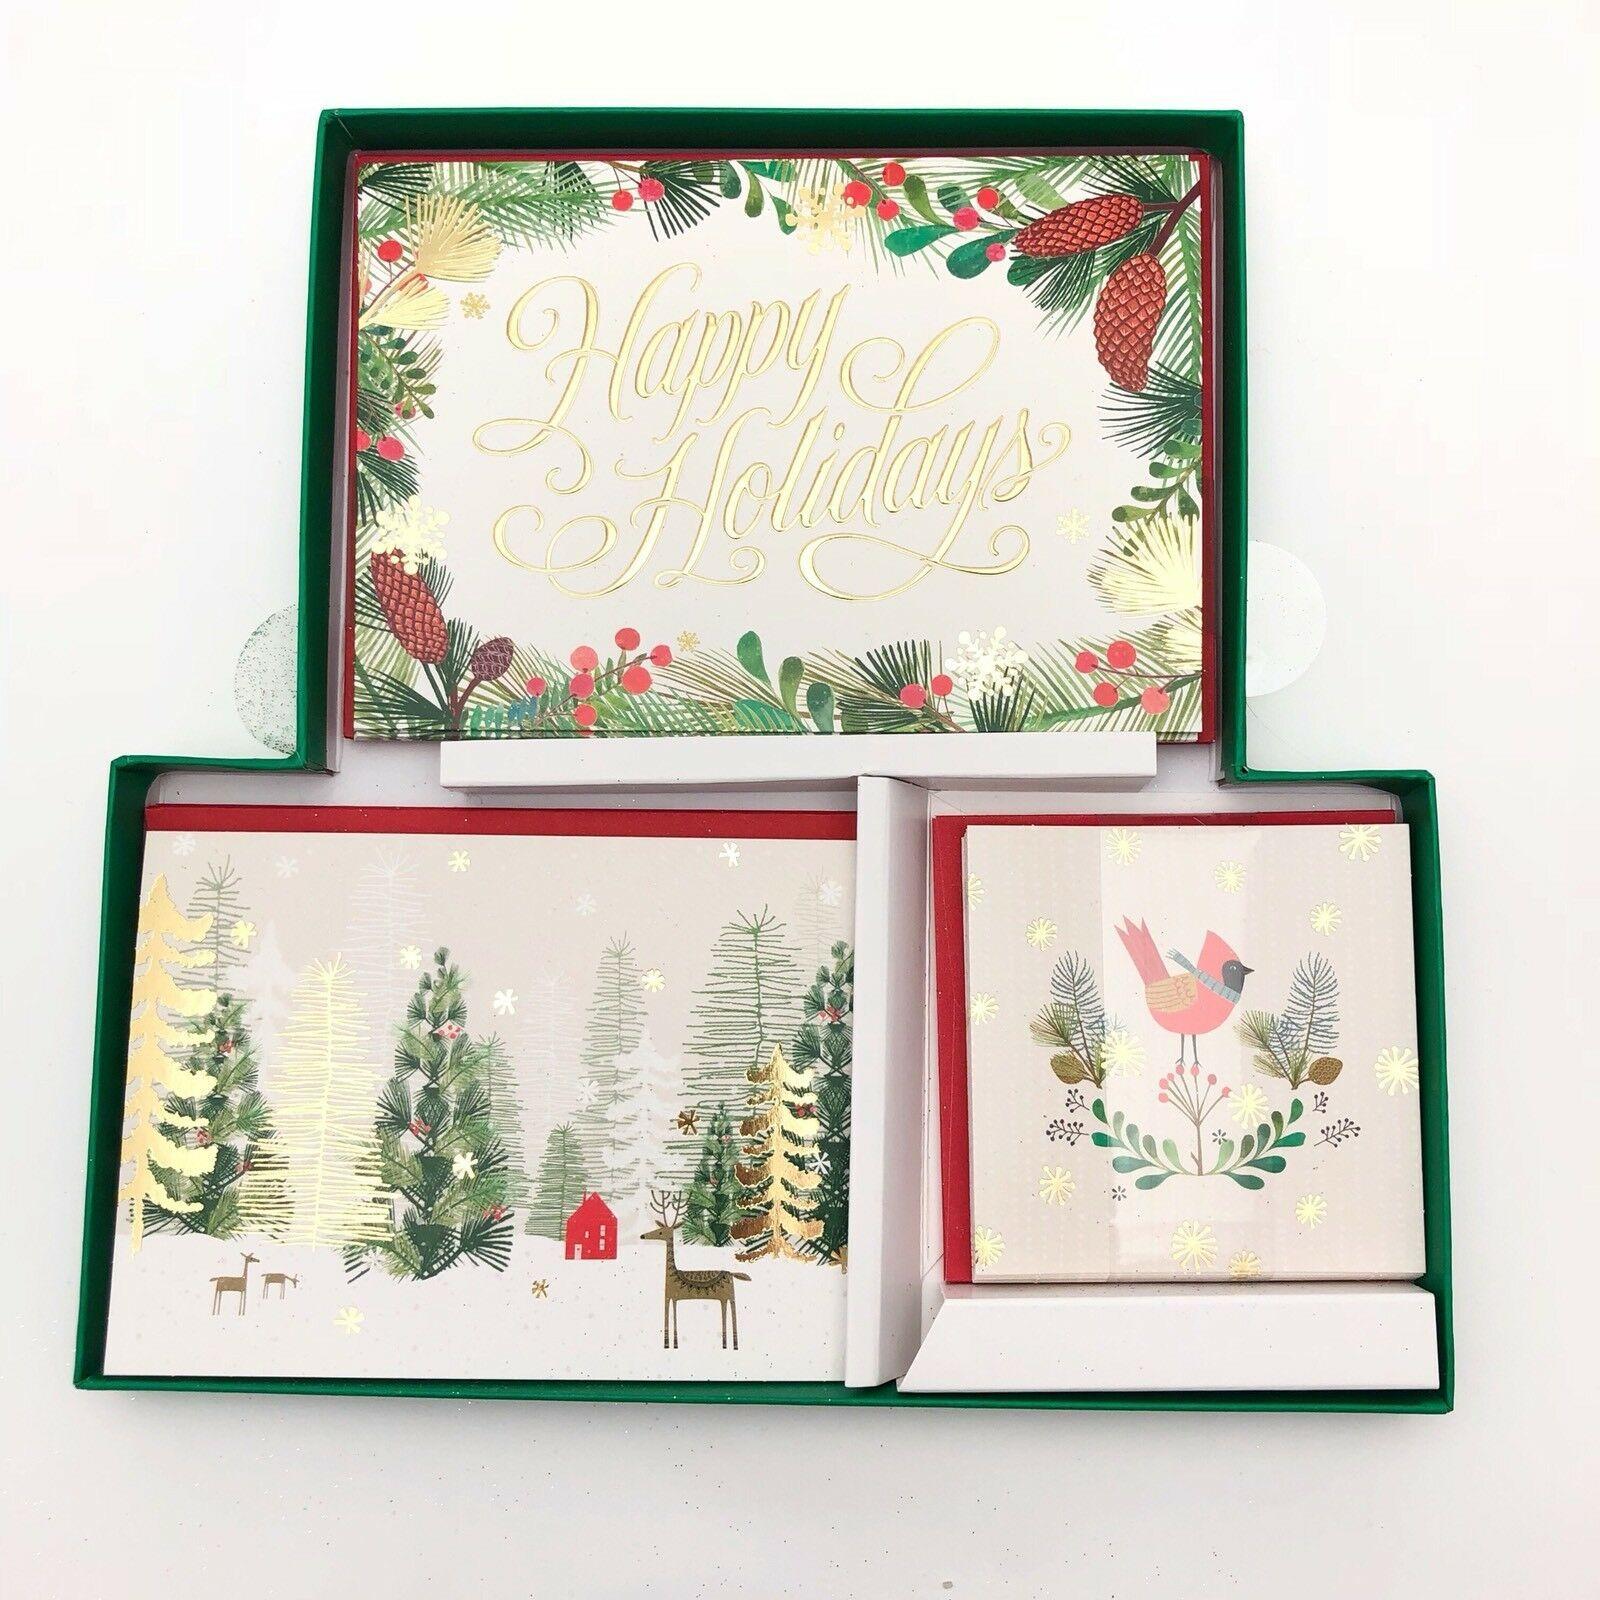 Hallmark Christmas Greeting Cards Boxed 24 And 50 Similar Items